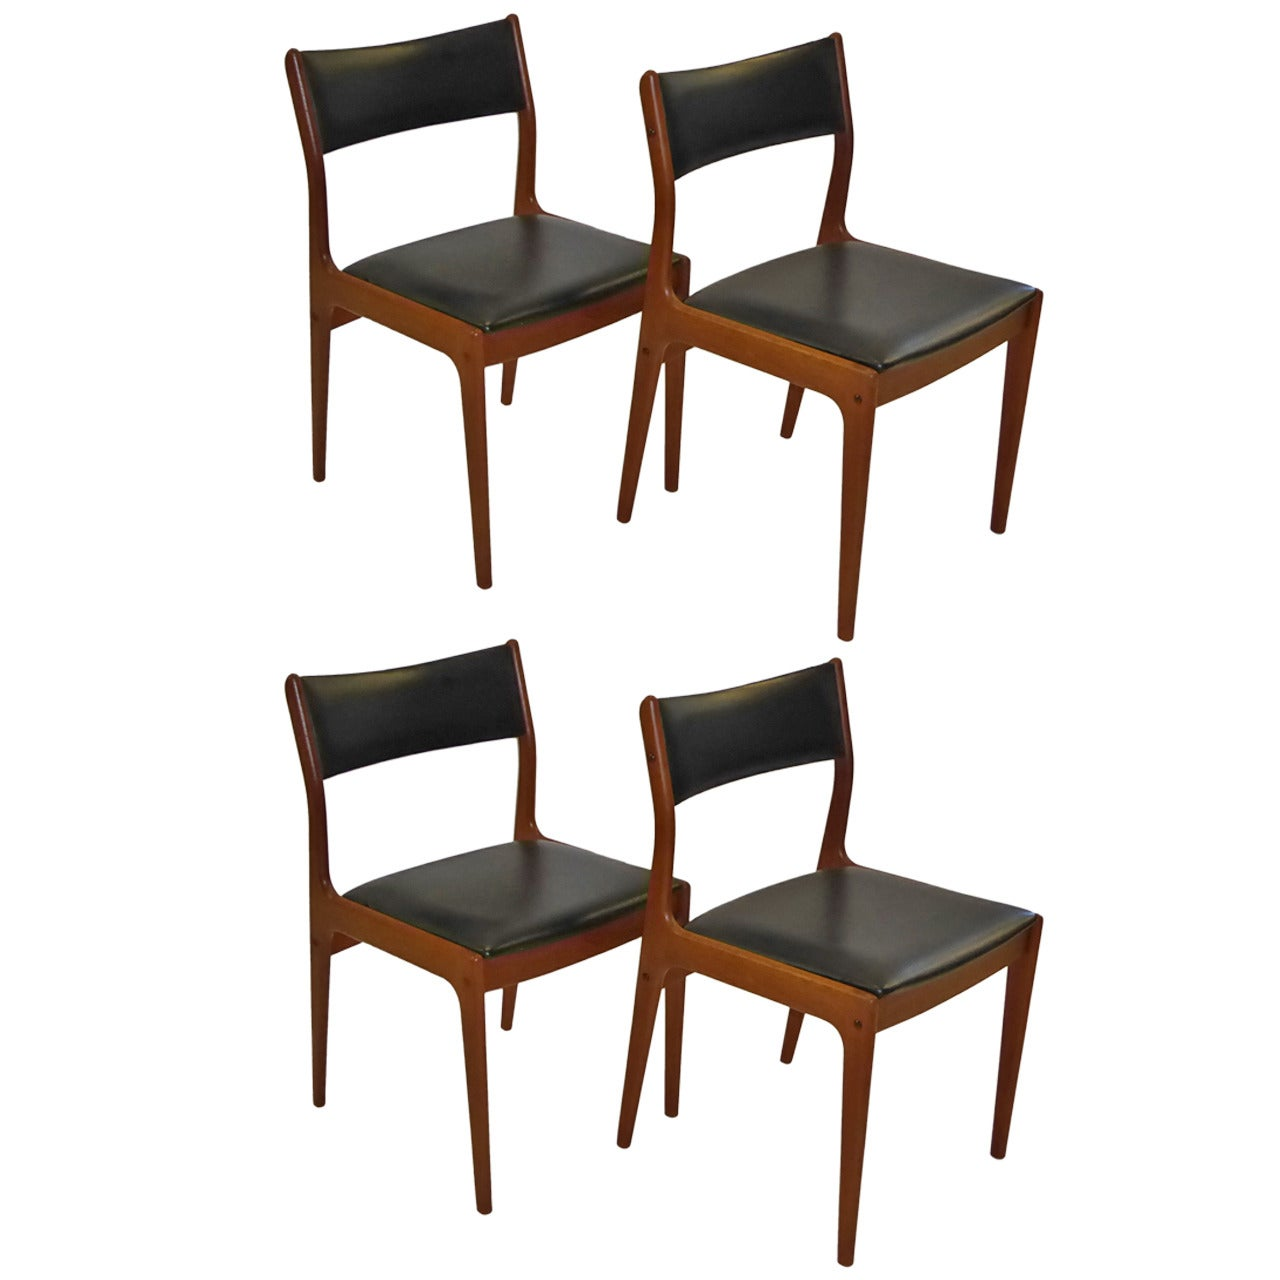 Johannes Andersen for Uldum Mobelfabrik Danish Teak Dining Chairs